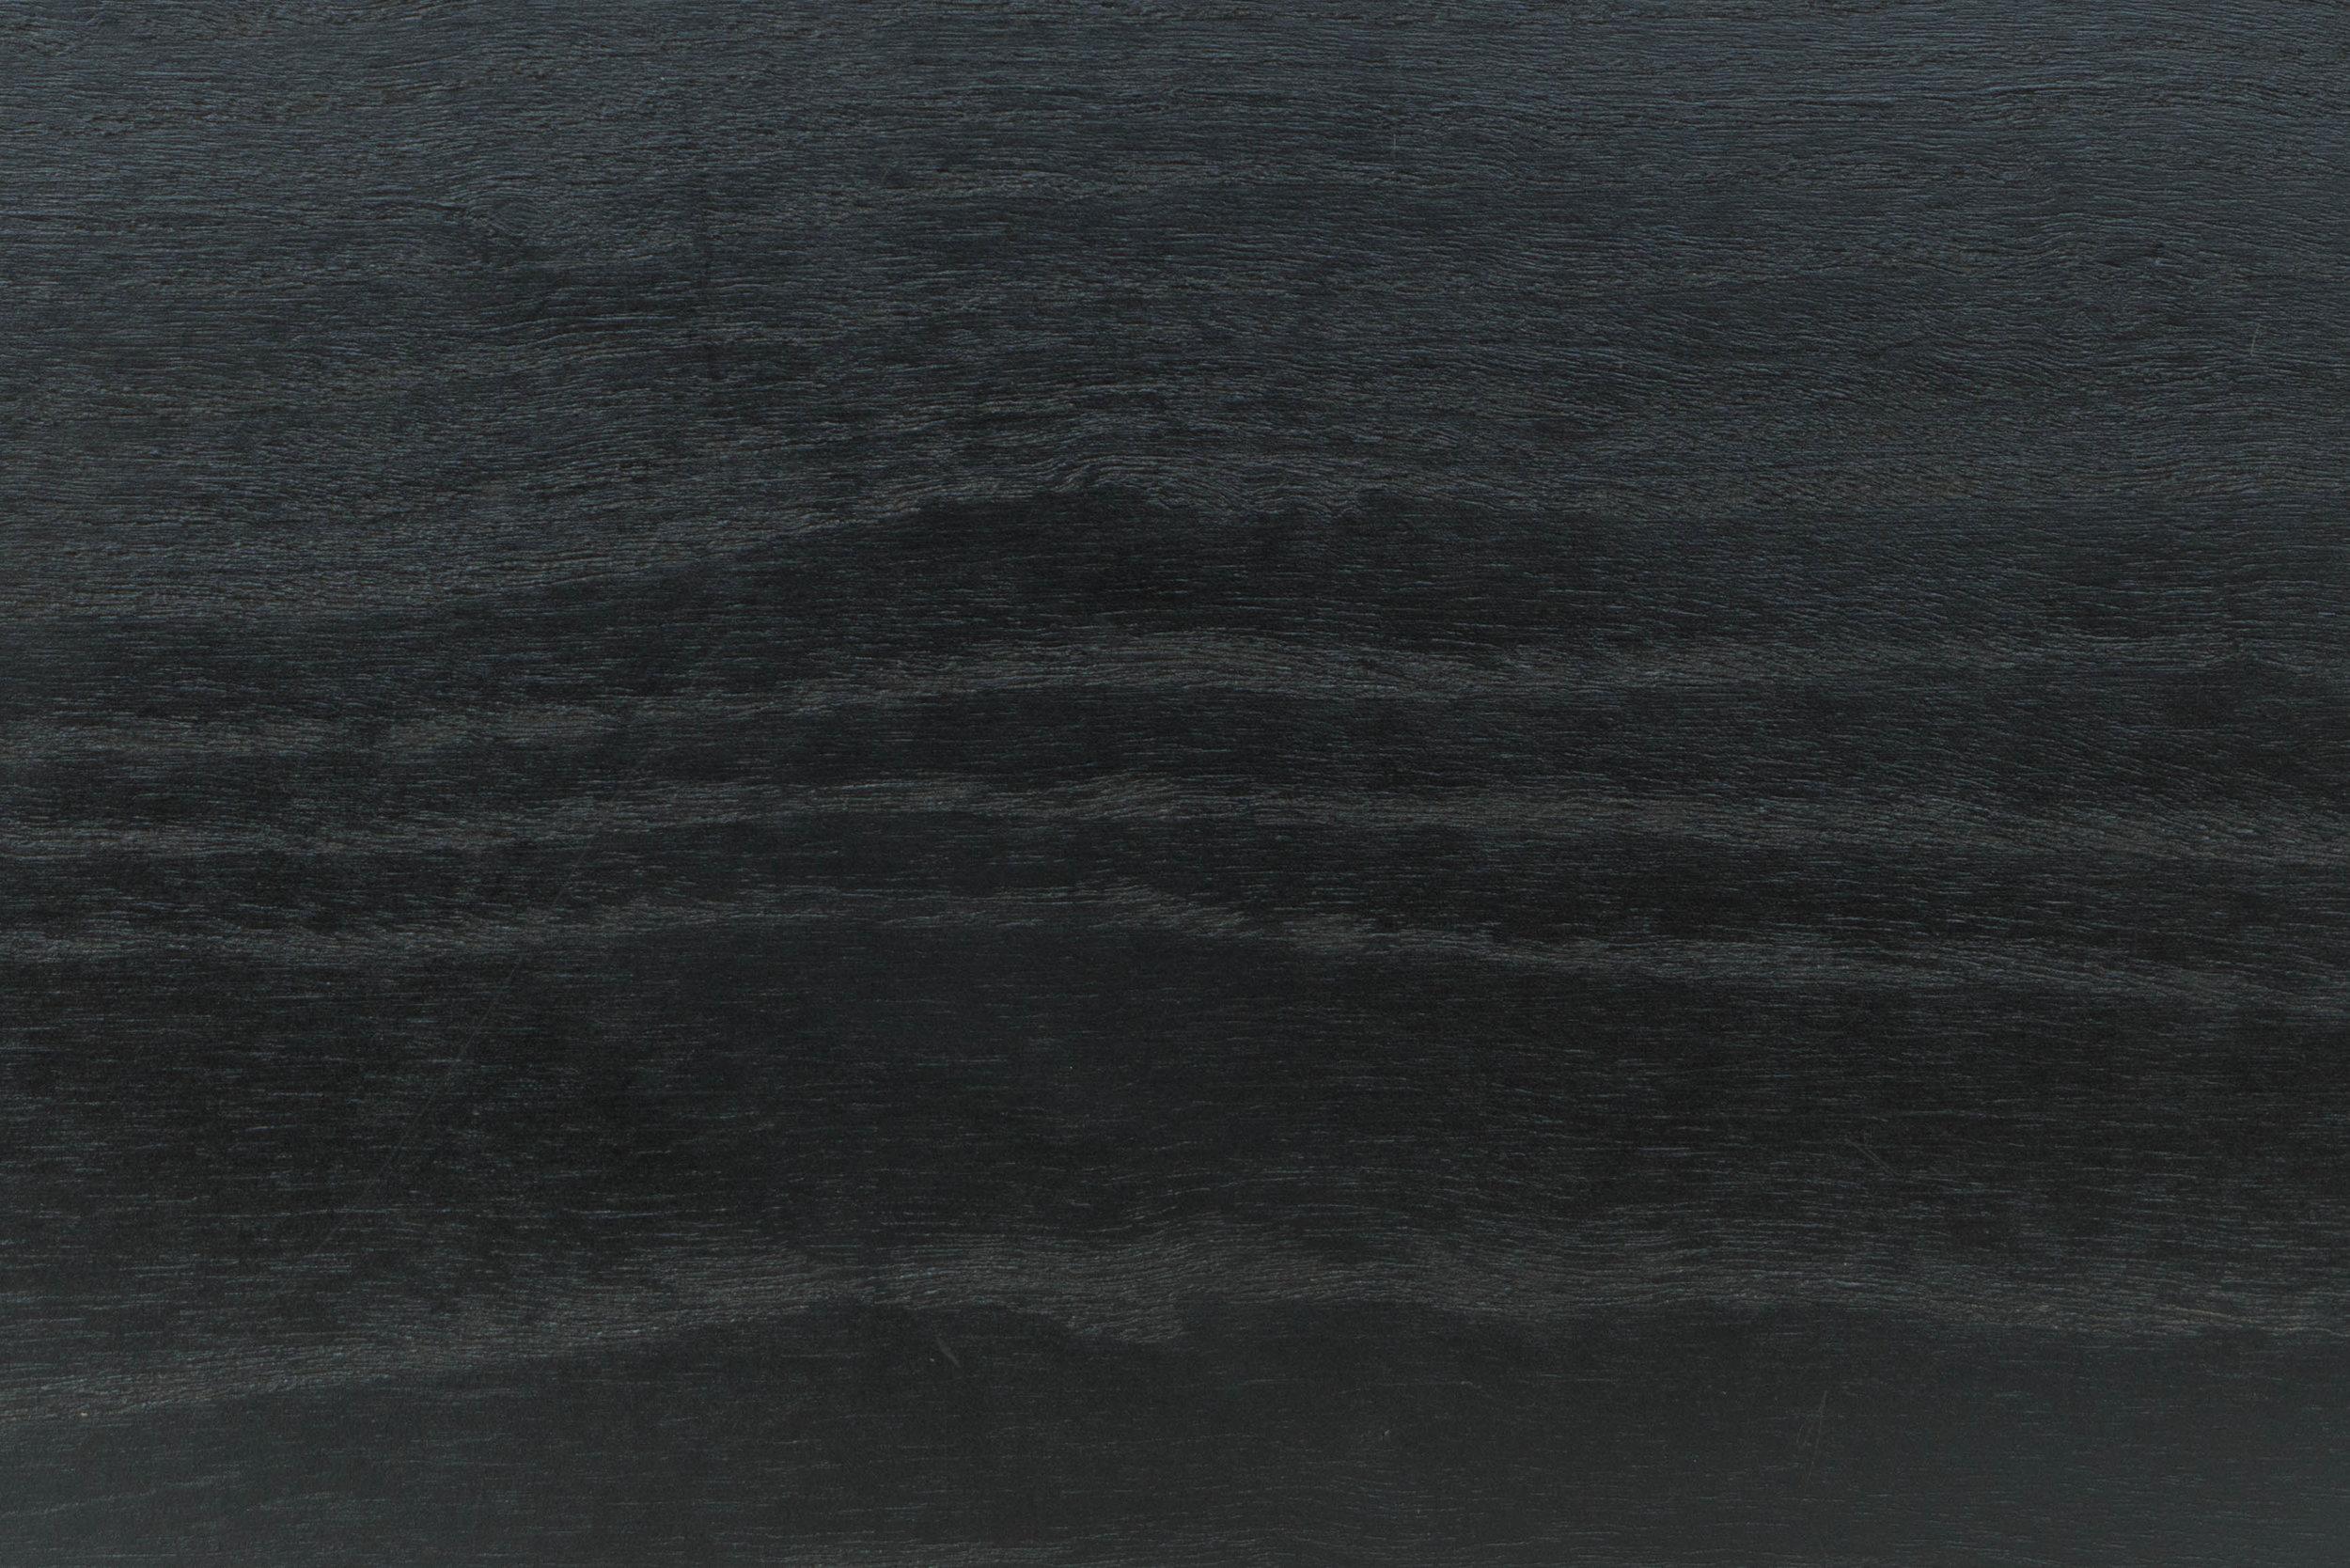 black_ash1.jpg